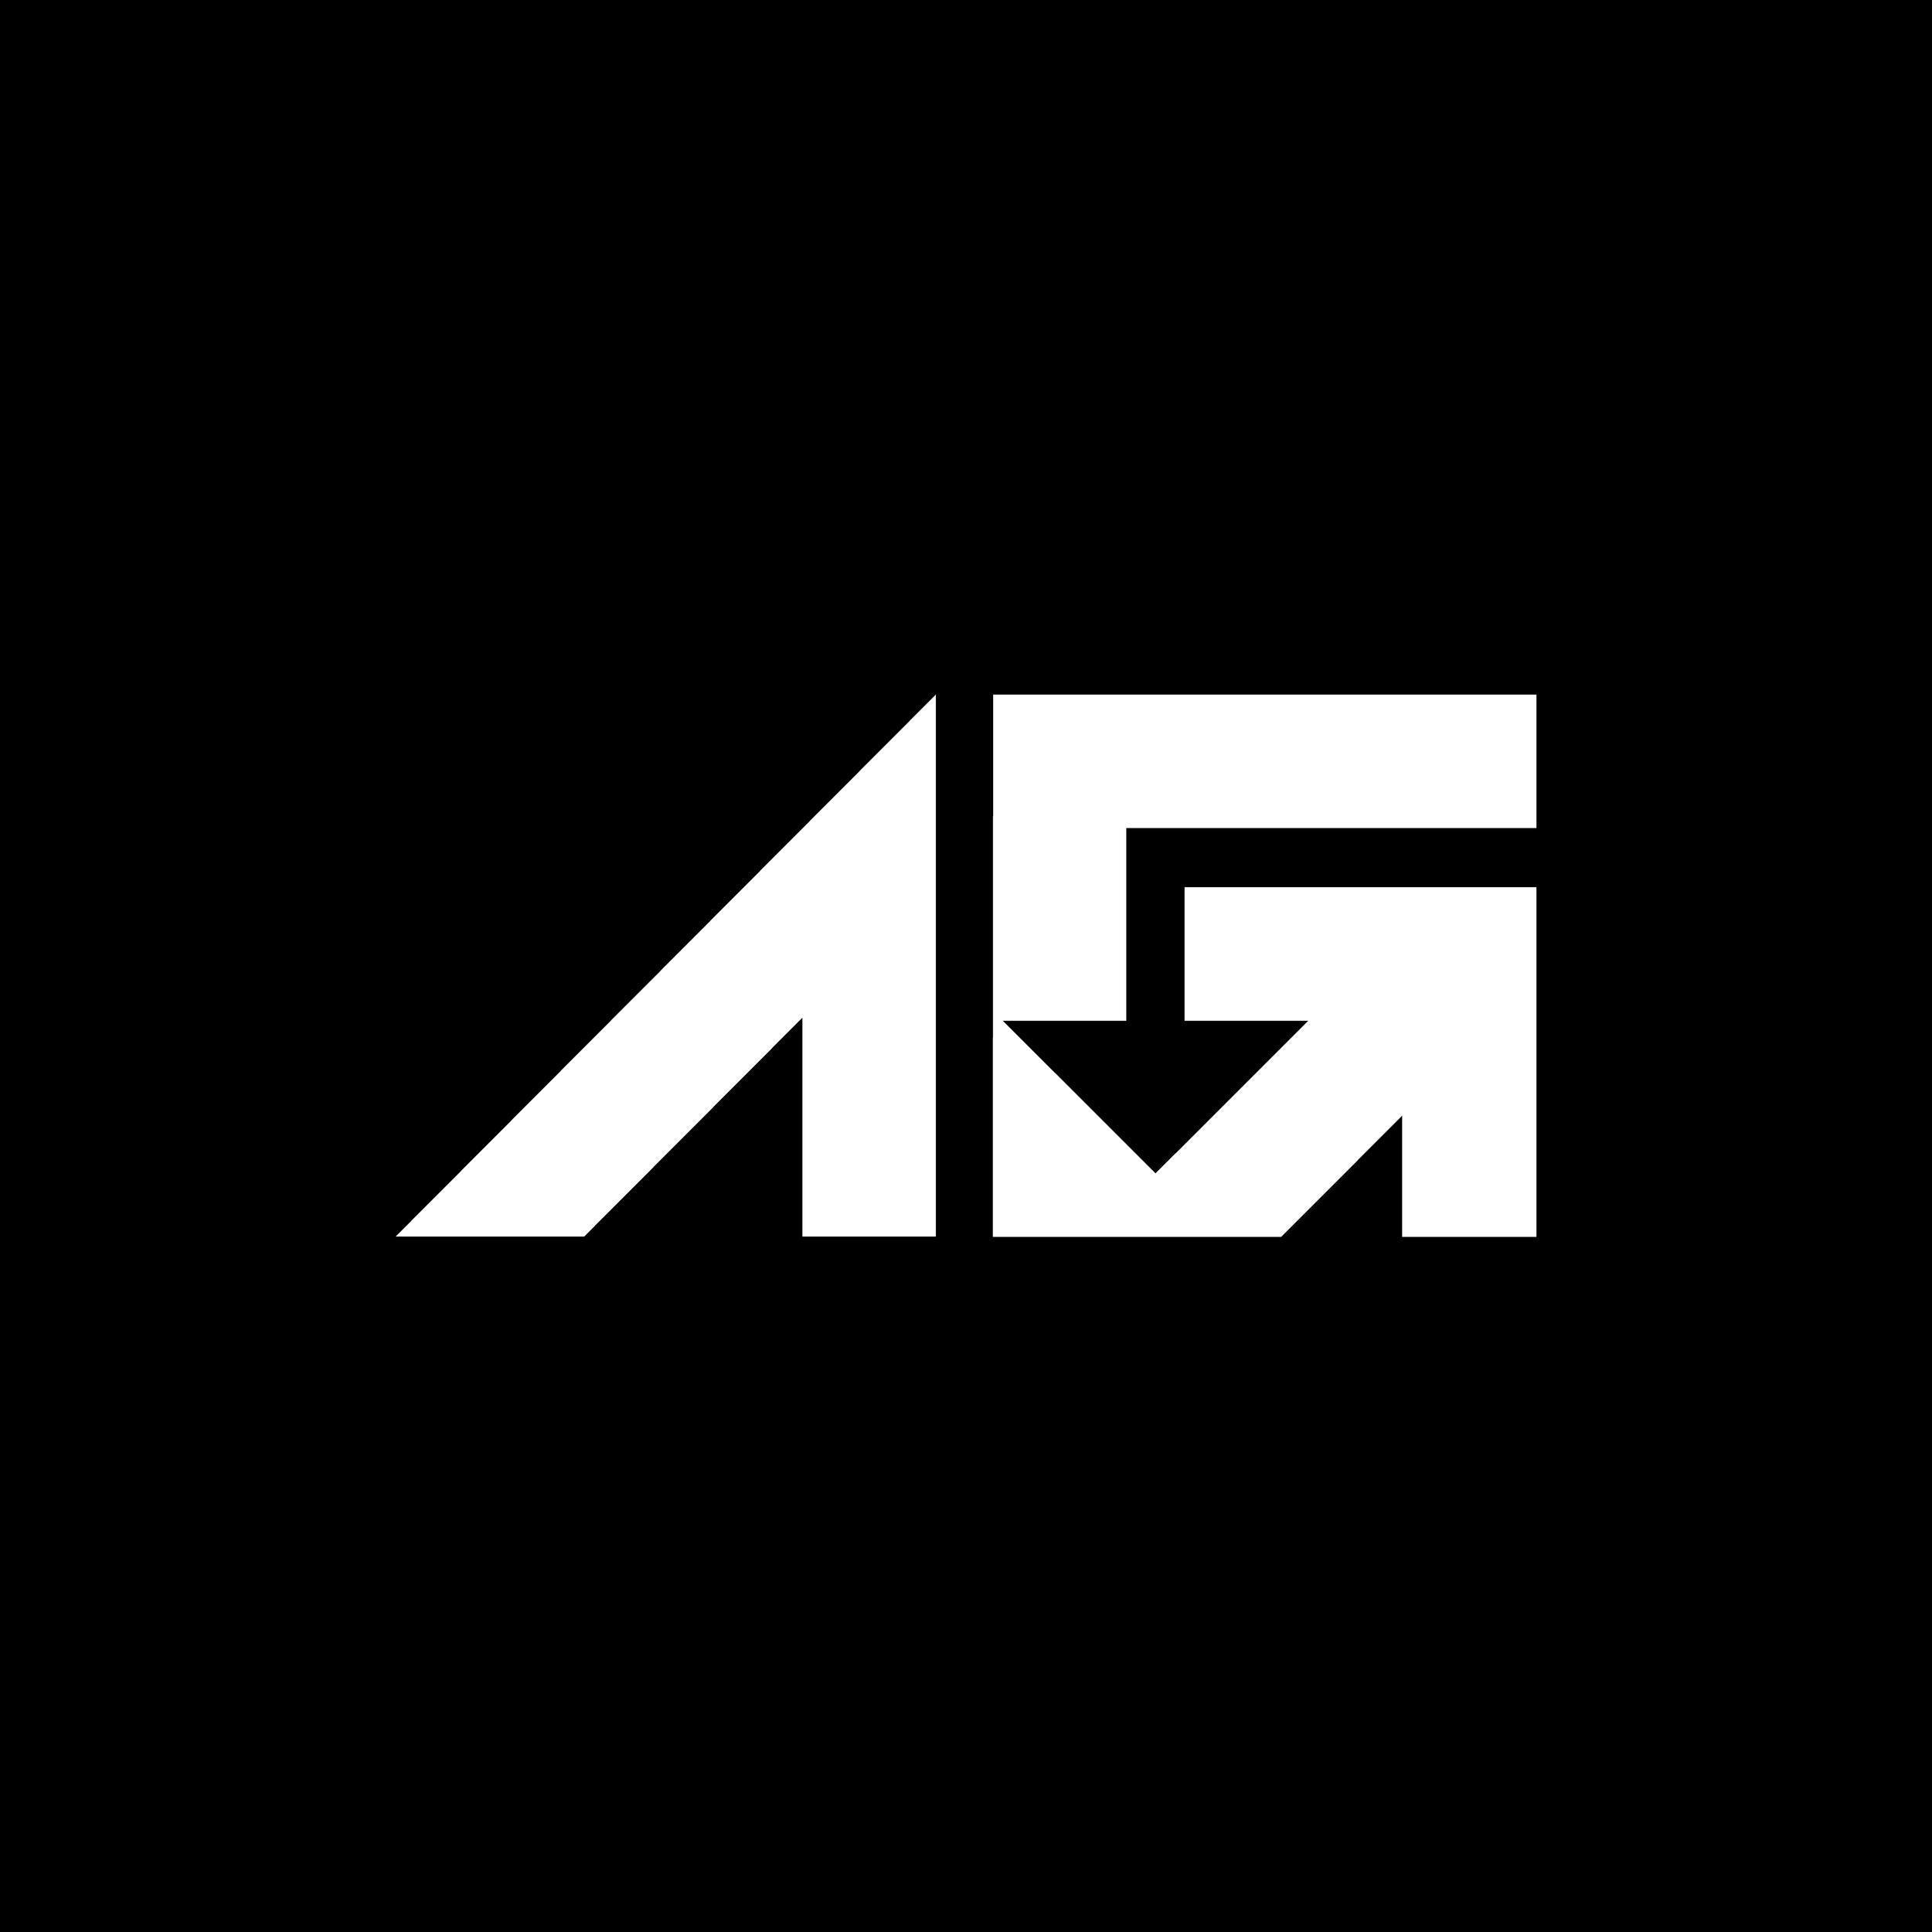 AG_LOGO_11.png